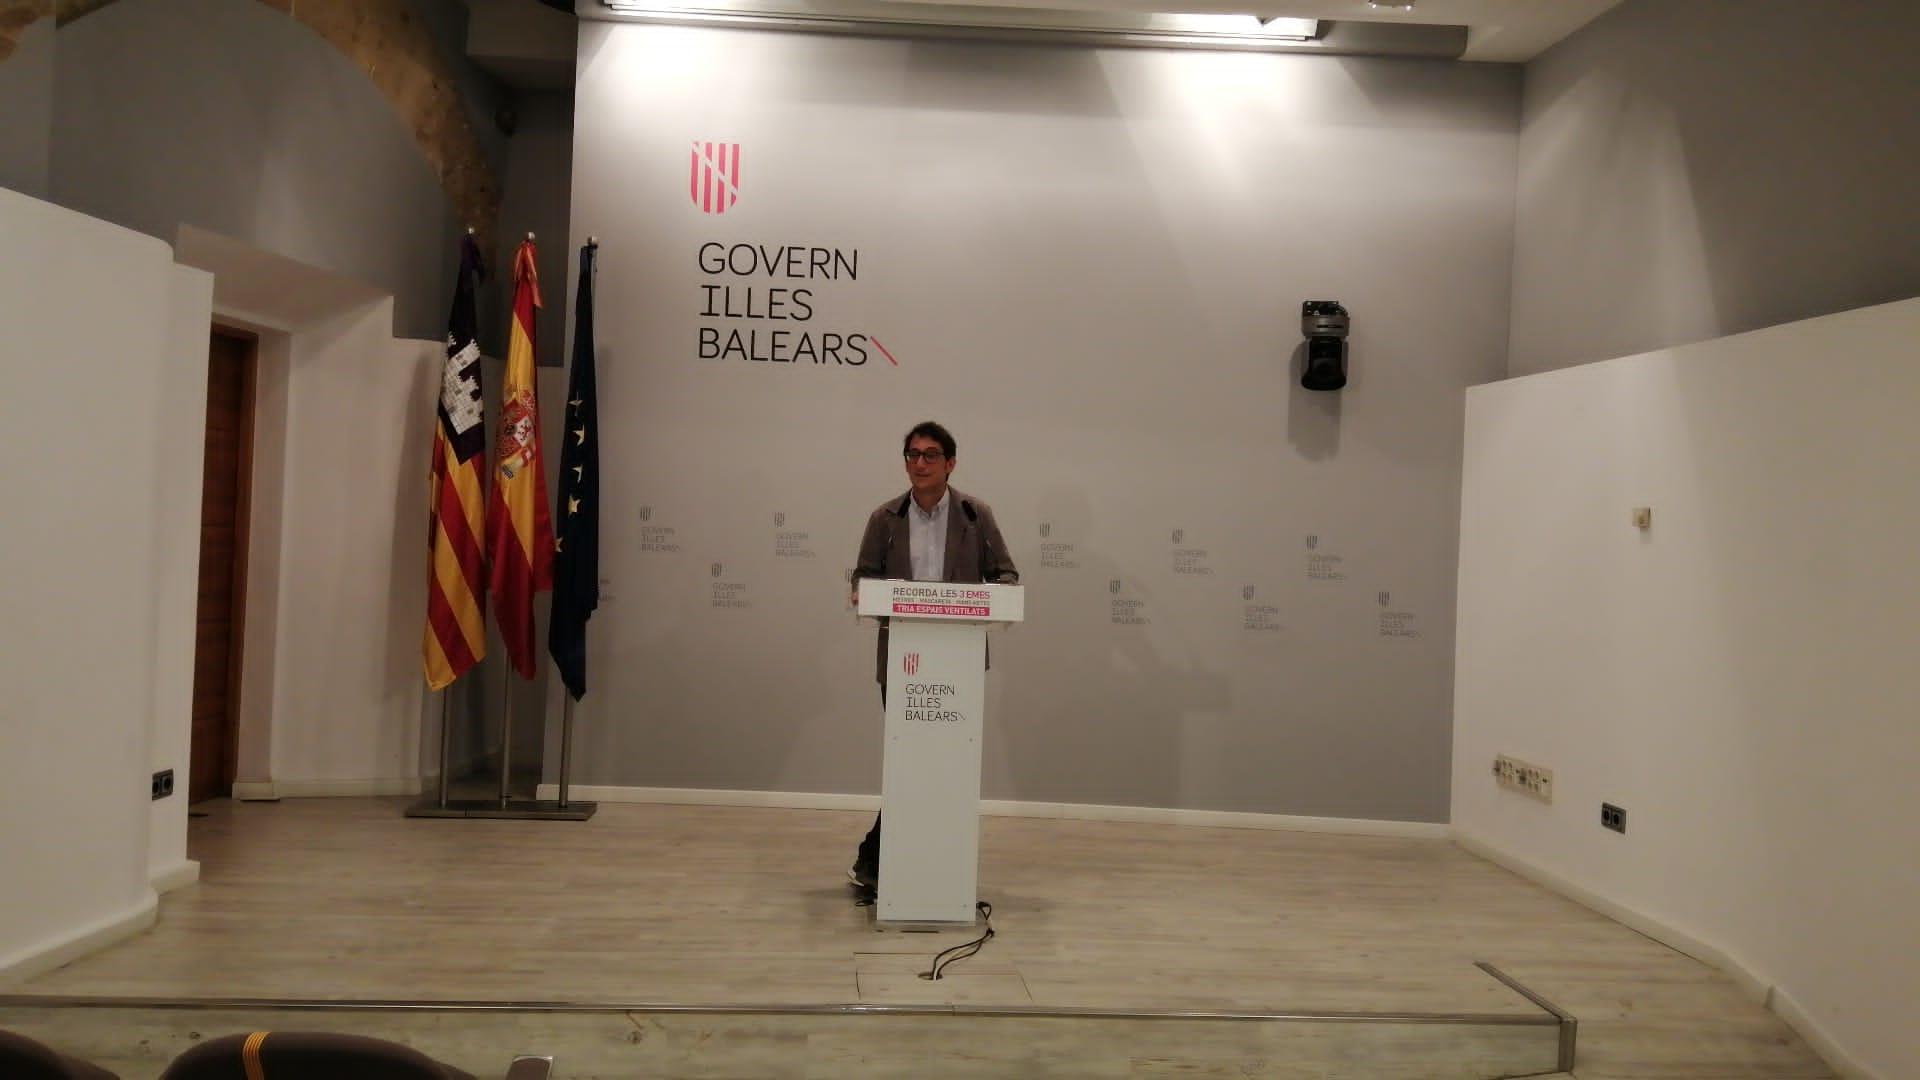 Balearen Ausgangssperren werden zum 6. Juni aufgehoben